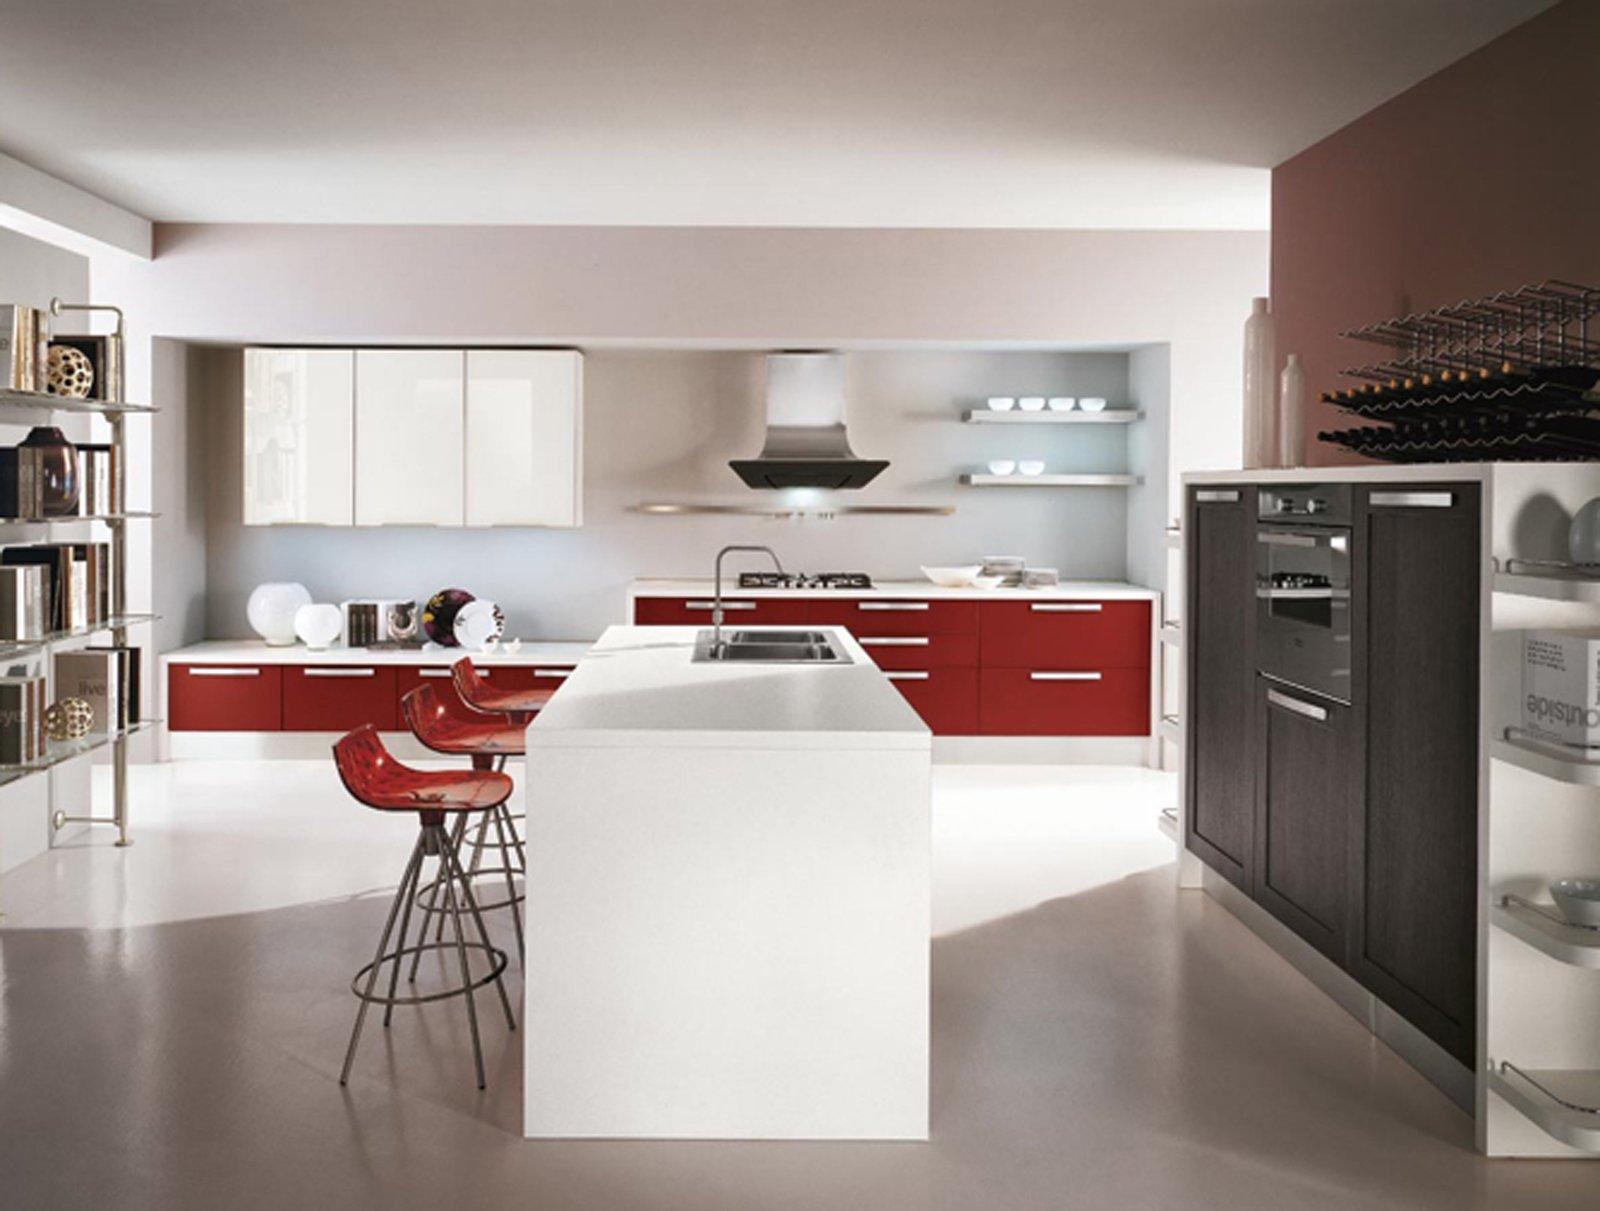 Dove Comprare La Cucina - Design Per La Casa Moderna - Ltay.net